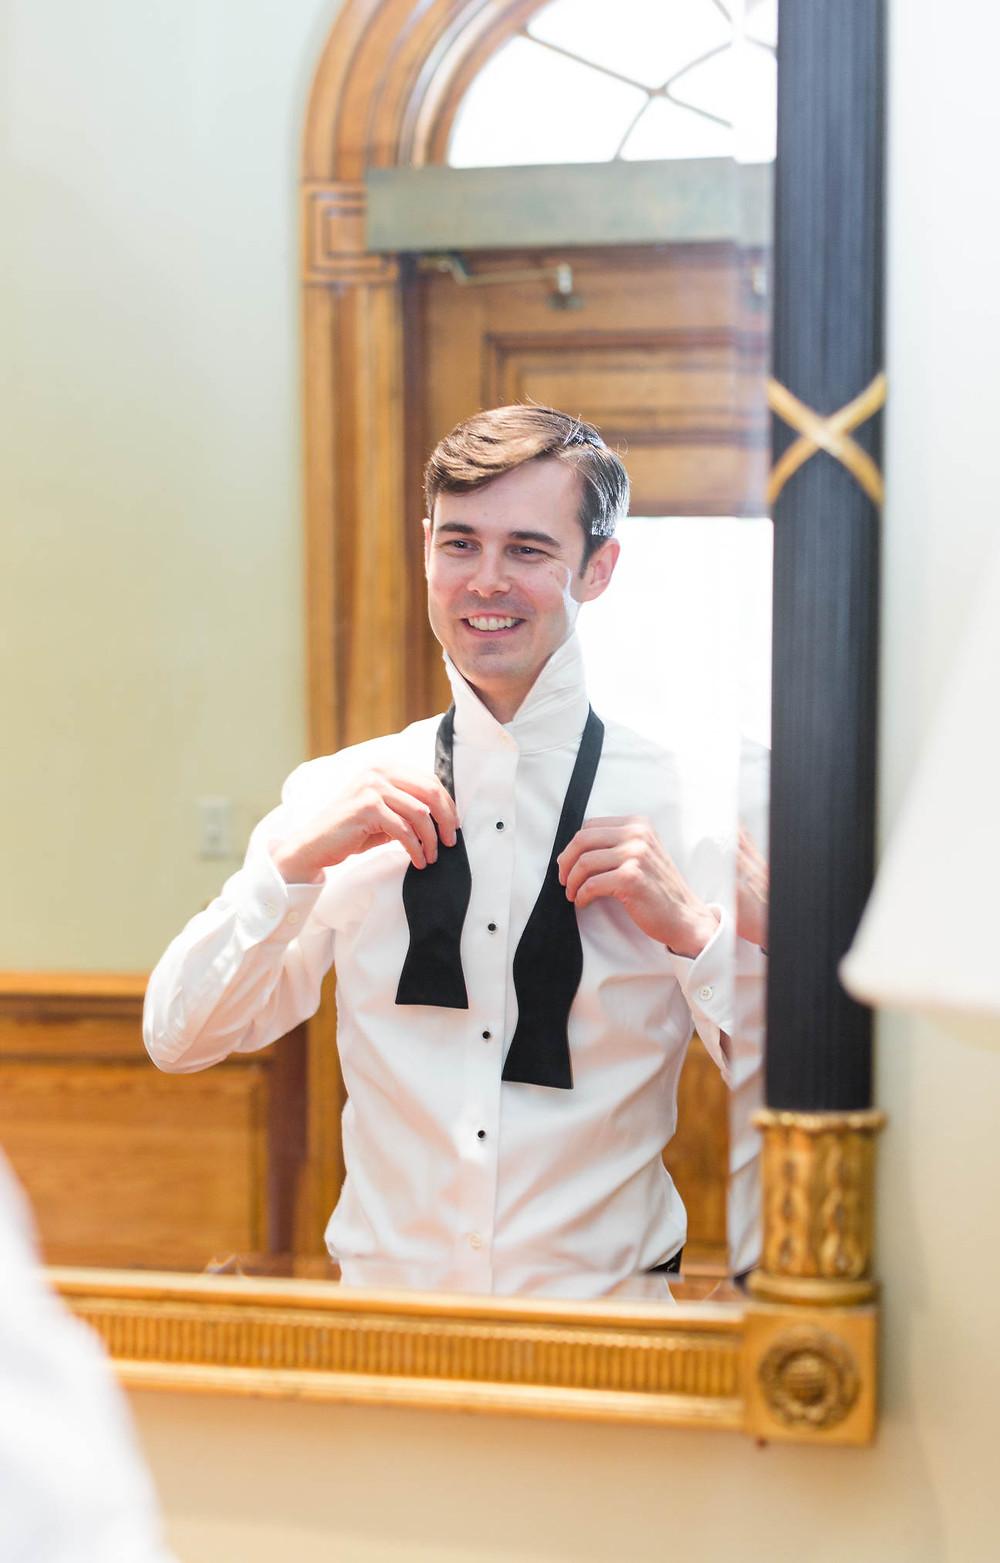 groom ties his bowtie in a mirror before his wedding